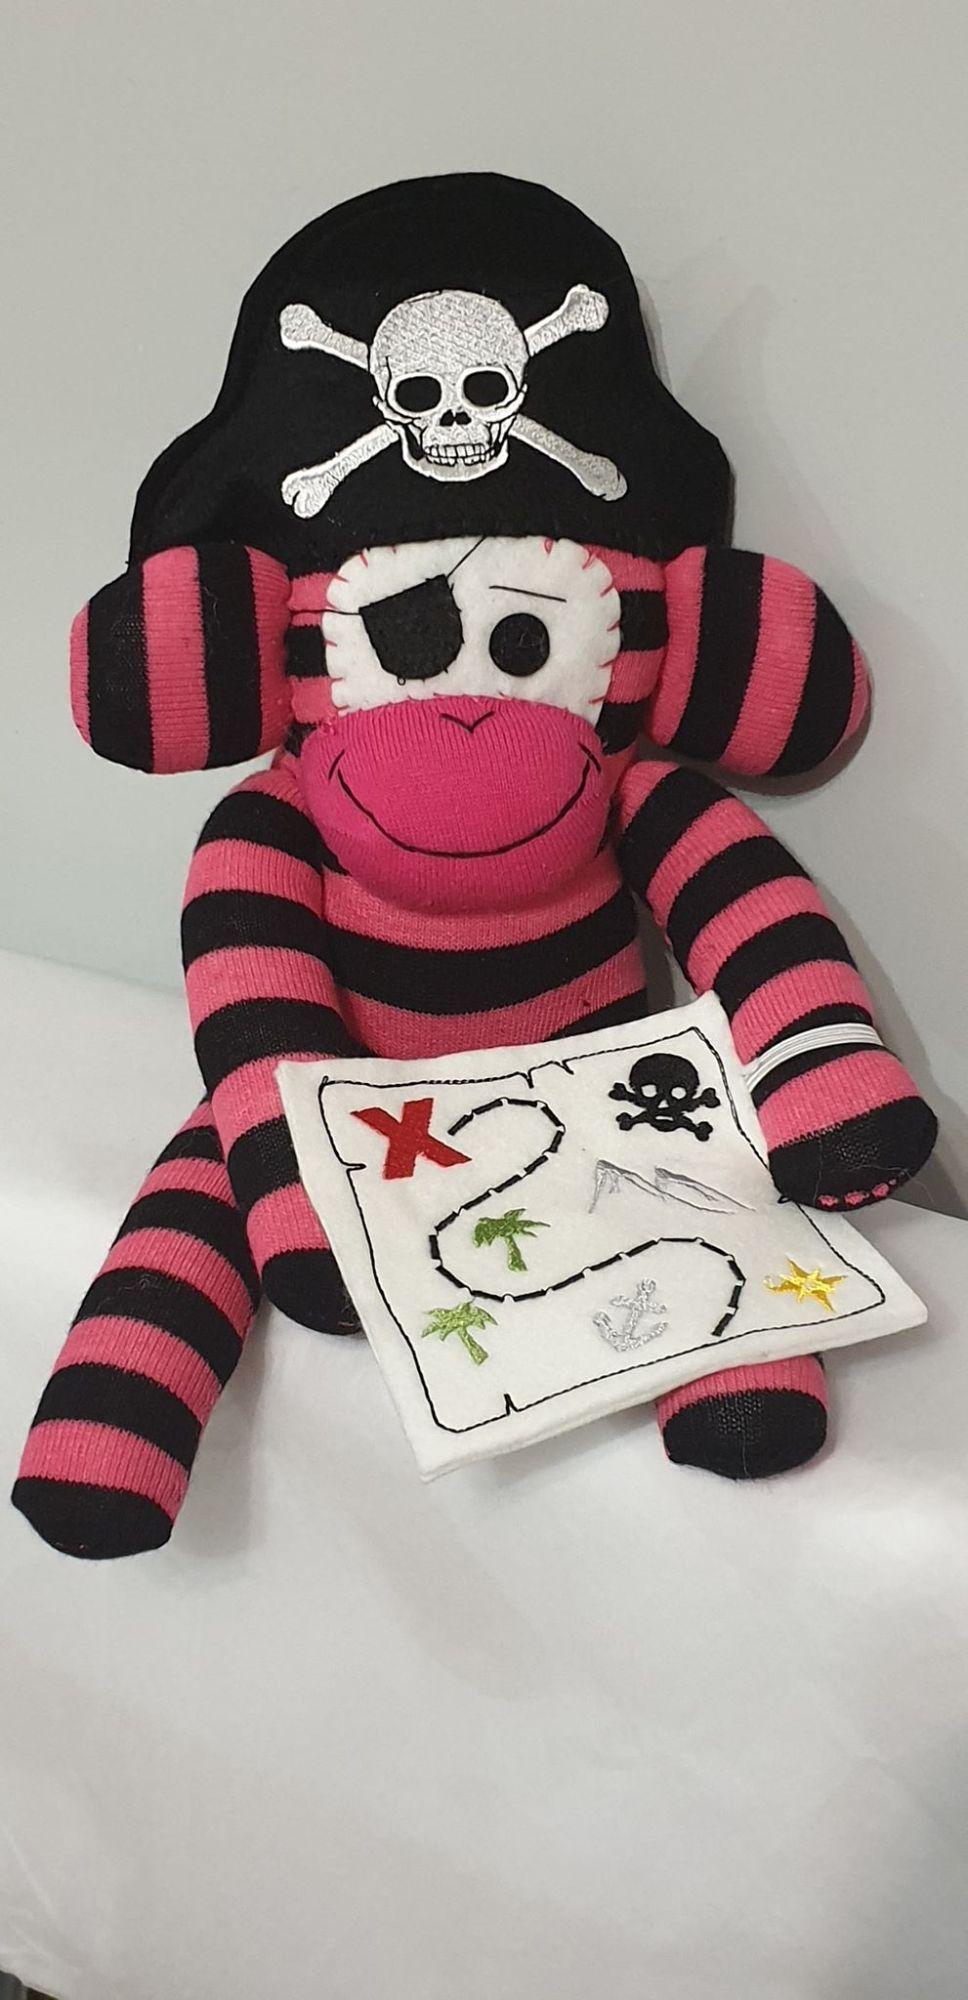 Back & pink  Striped Sock Monkey Pirate